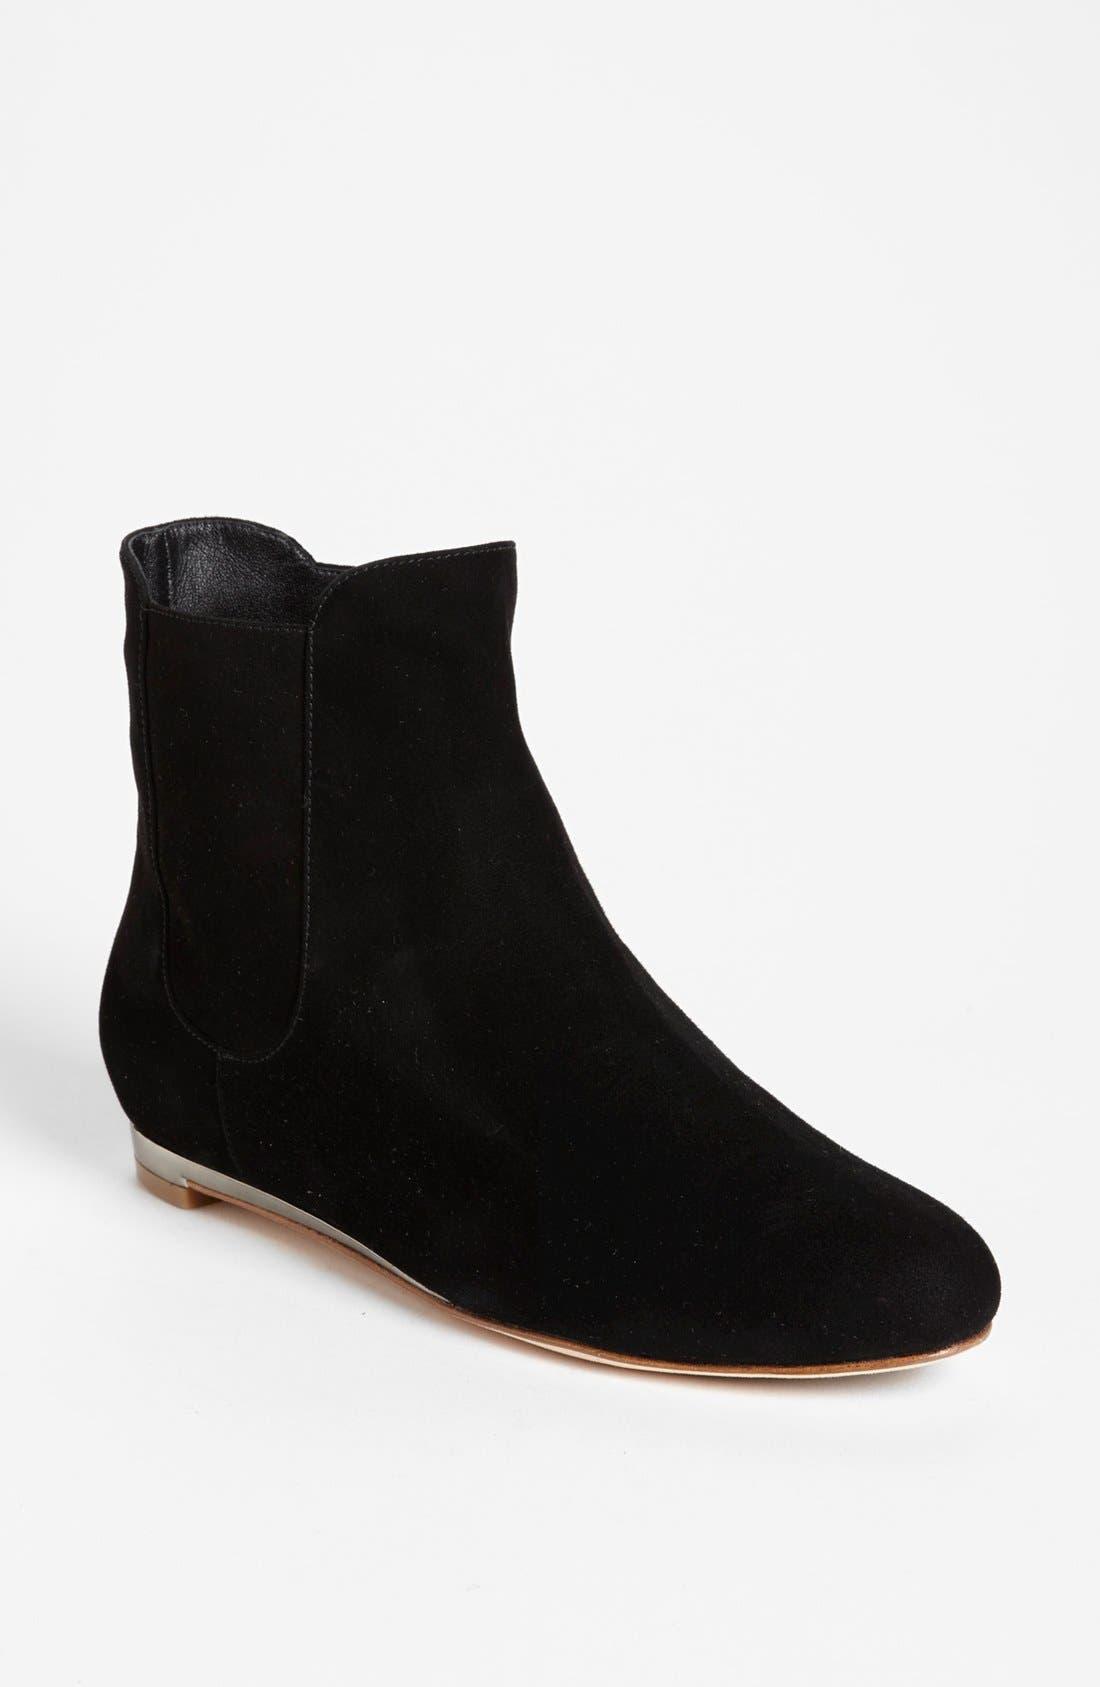 Alternate Image 1 Selected - Cole Haan 'Astoria' Boot